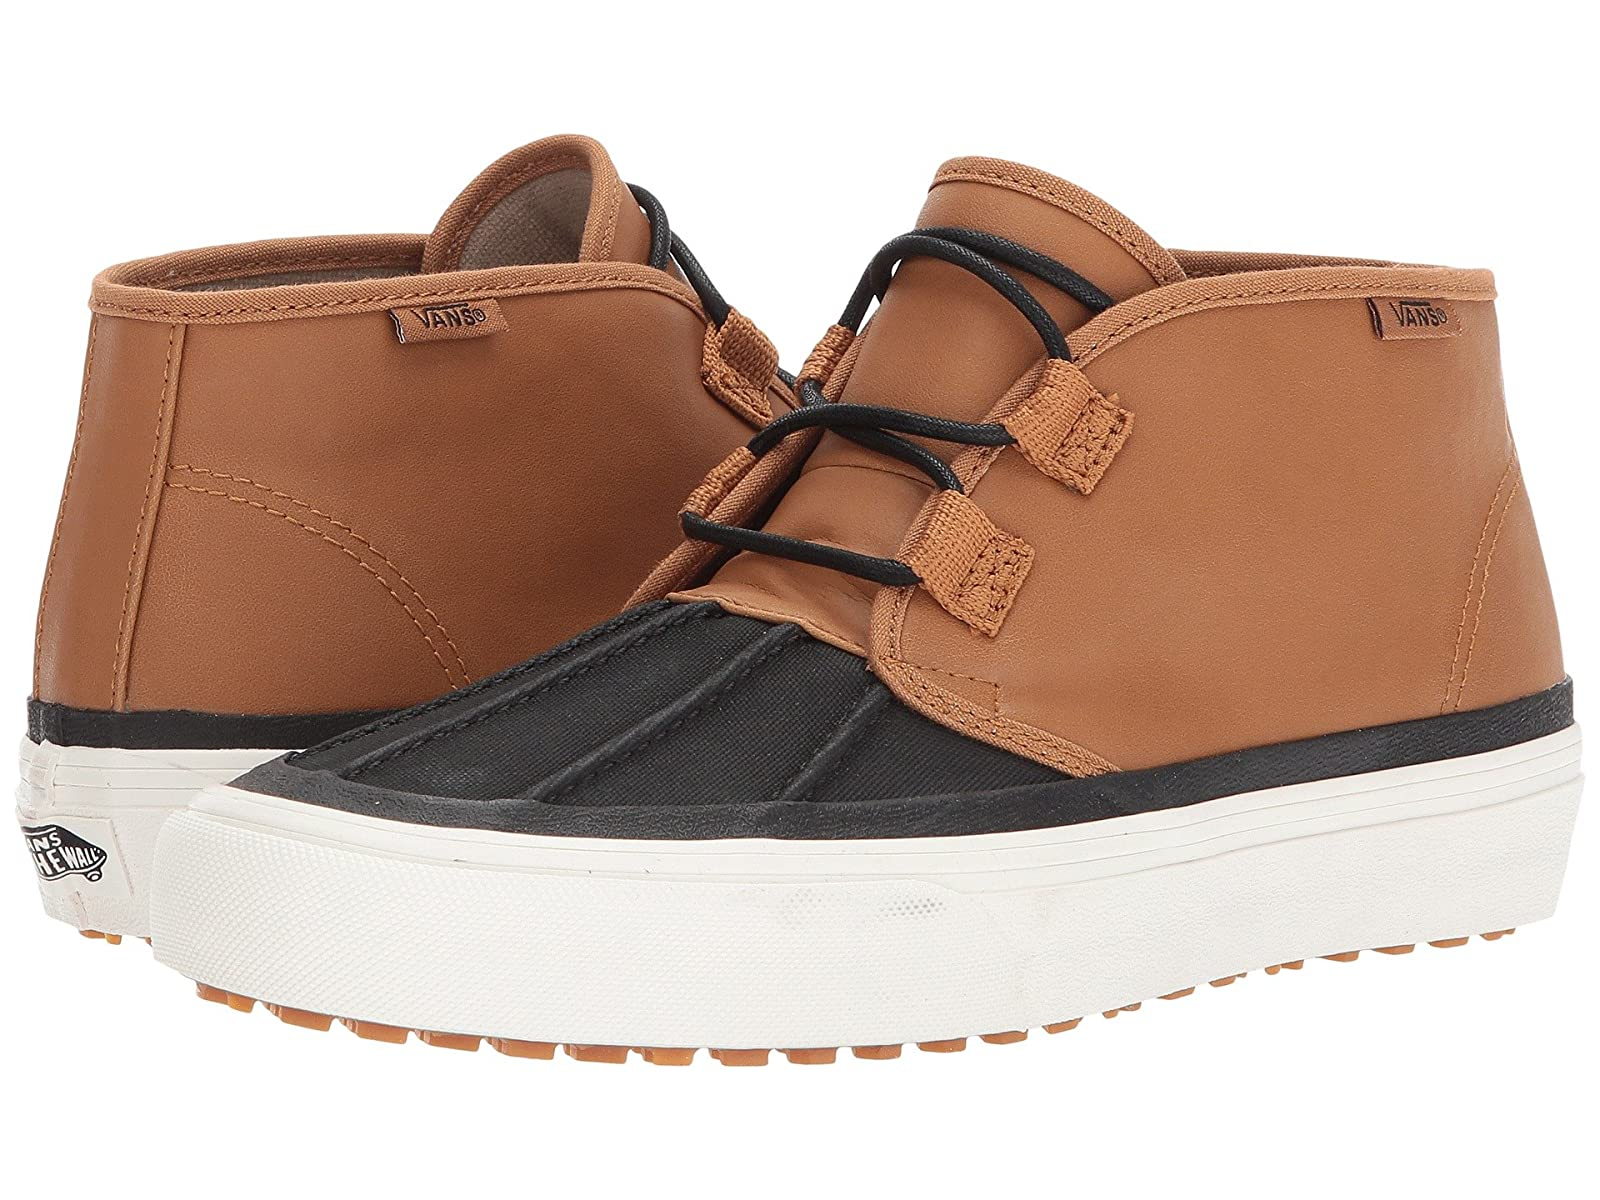 Vans Prairie Chukka MTEAtmospheric grades have affordable shoes